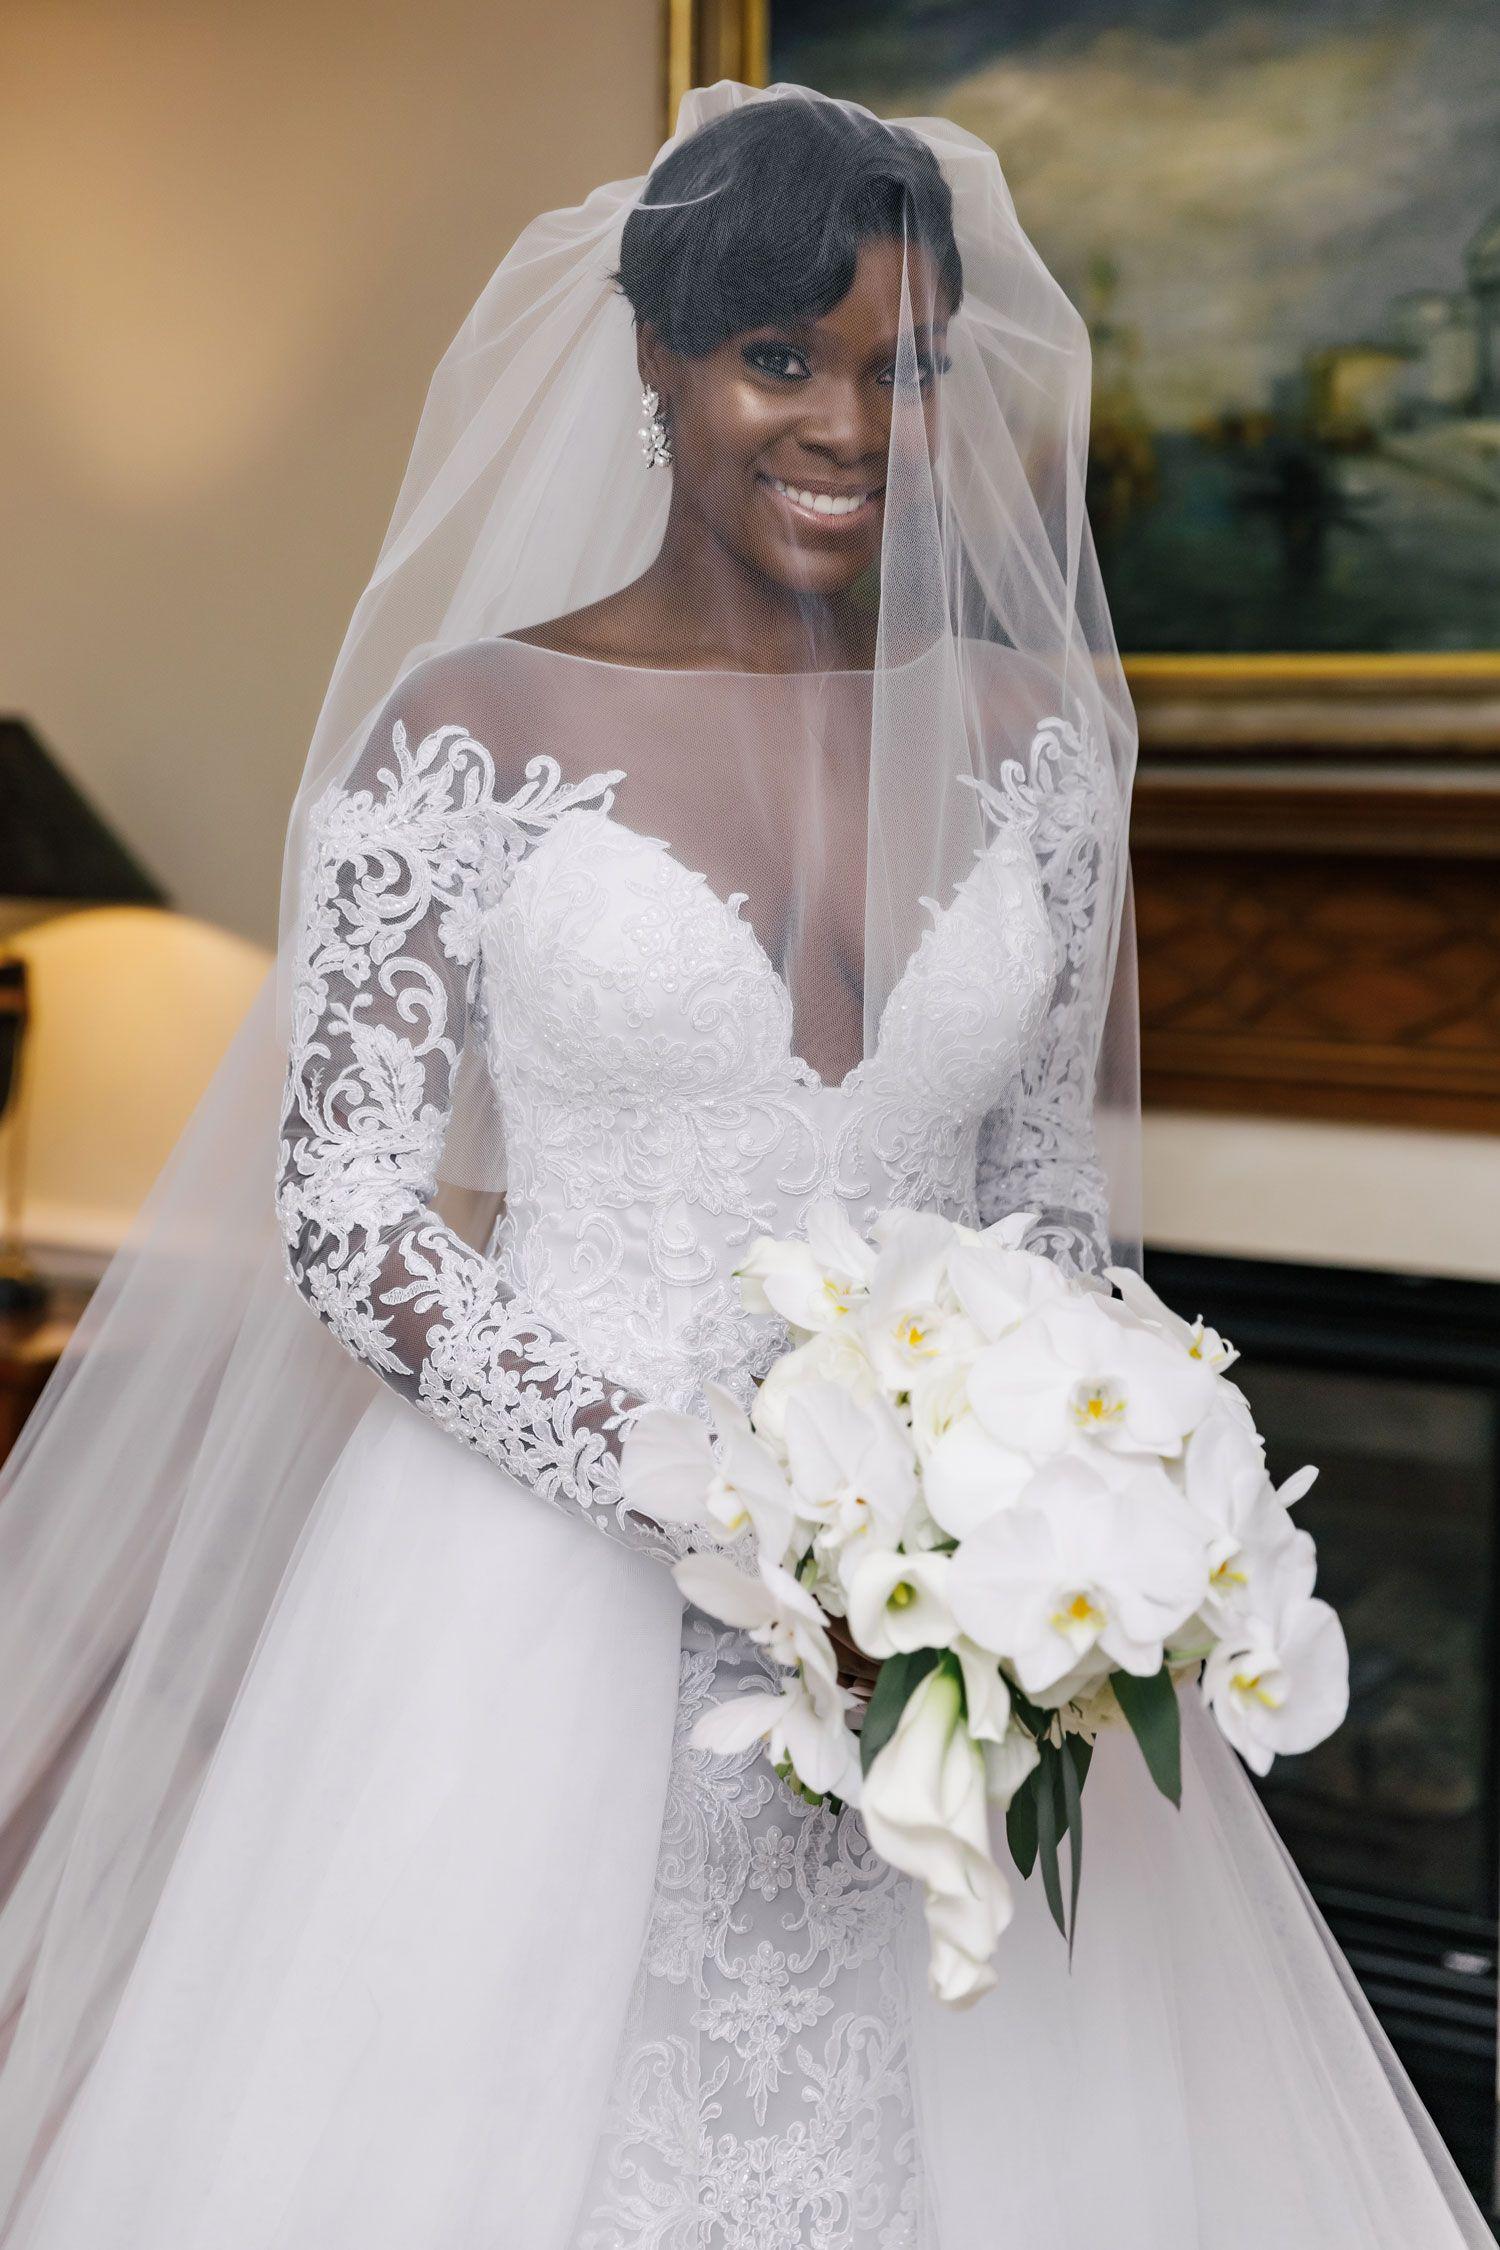 Modern, Elegant Wedding with Warm & Inviting White + Gold